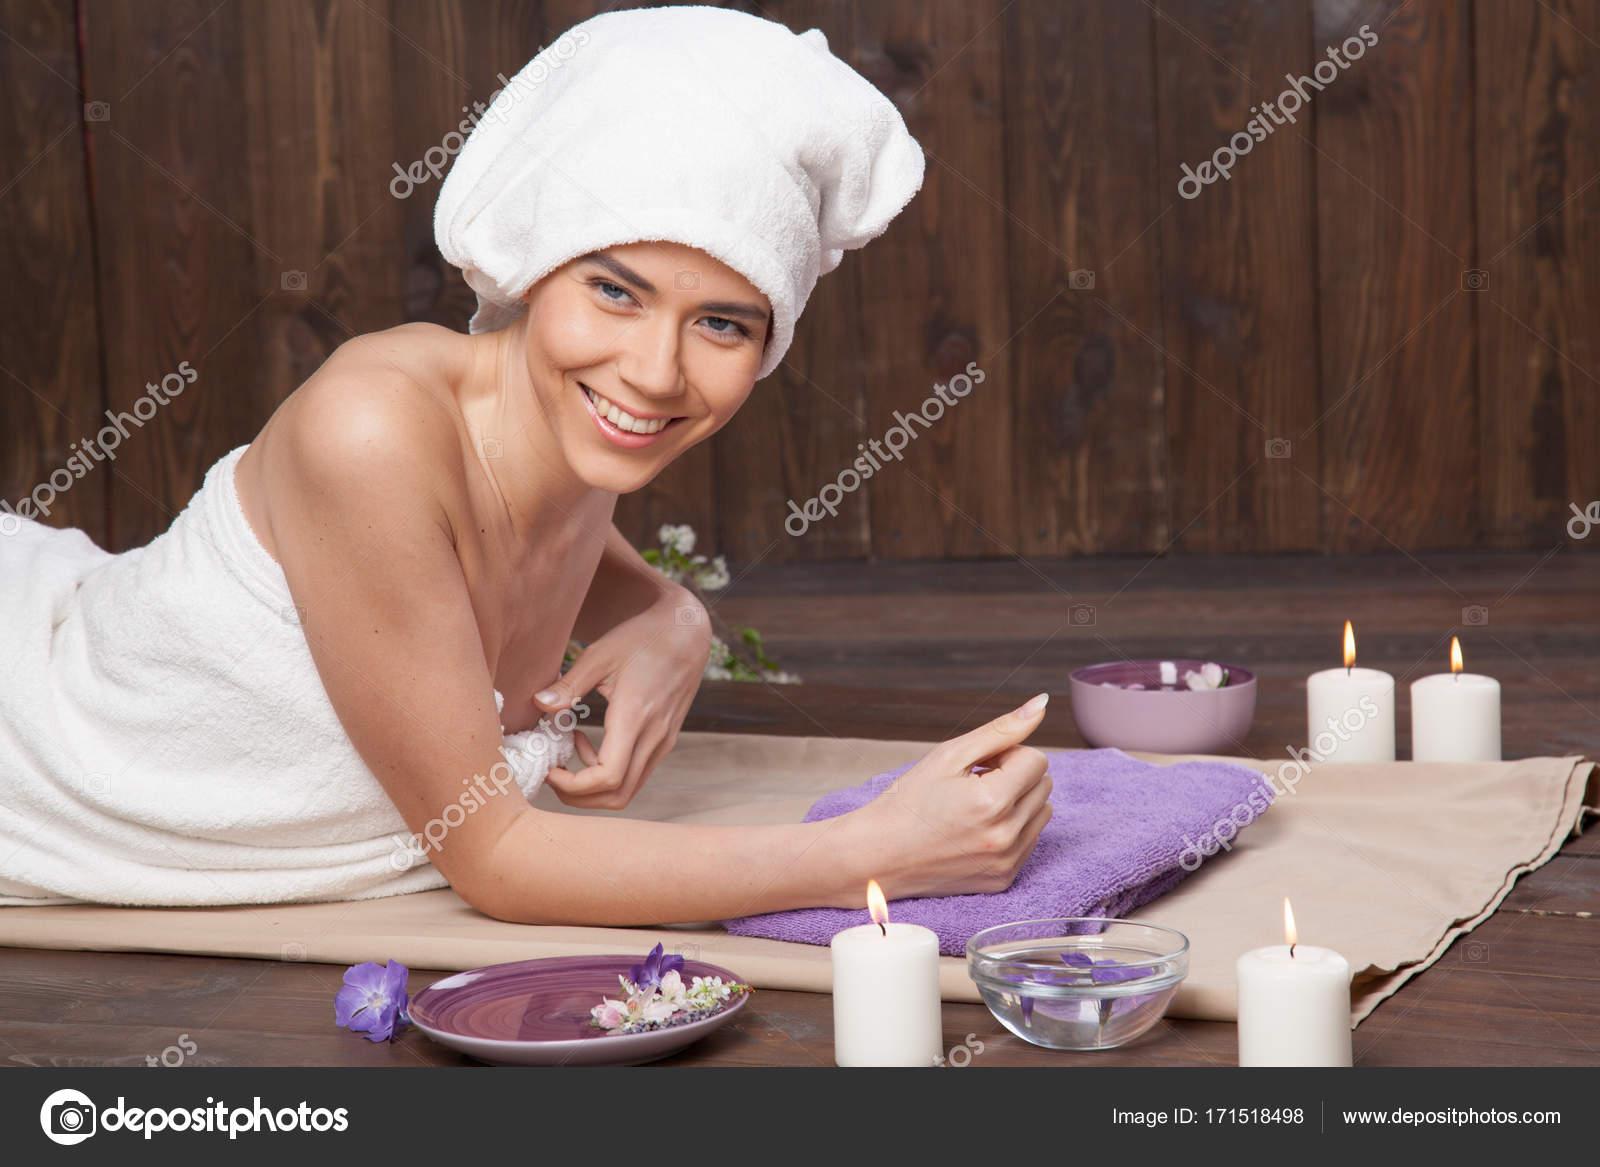 Сауна с массажем от девушек секс скользки массаж